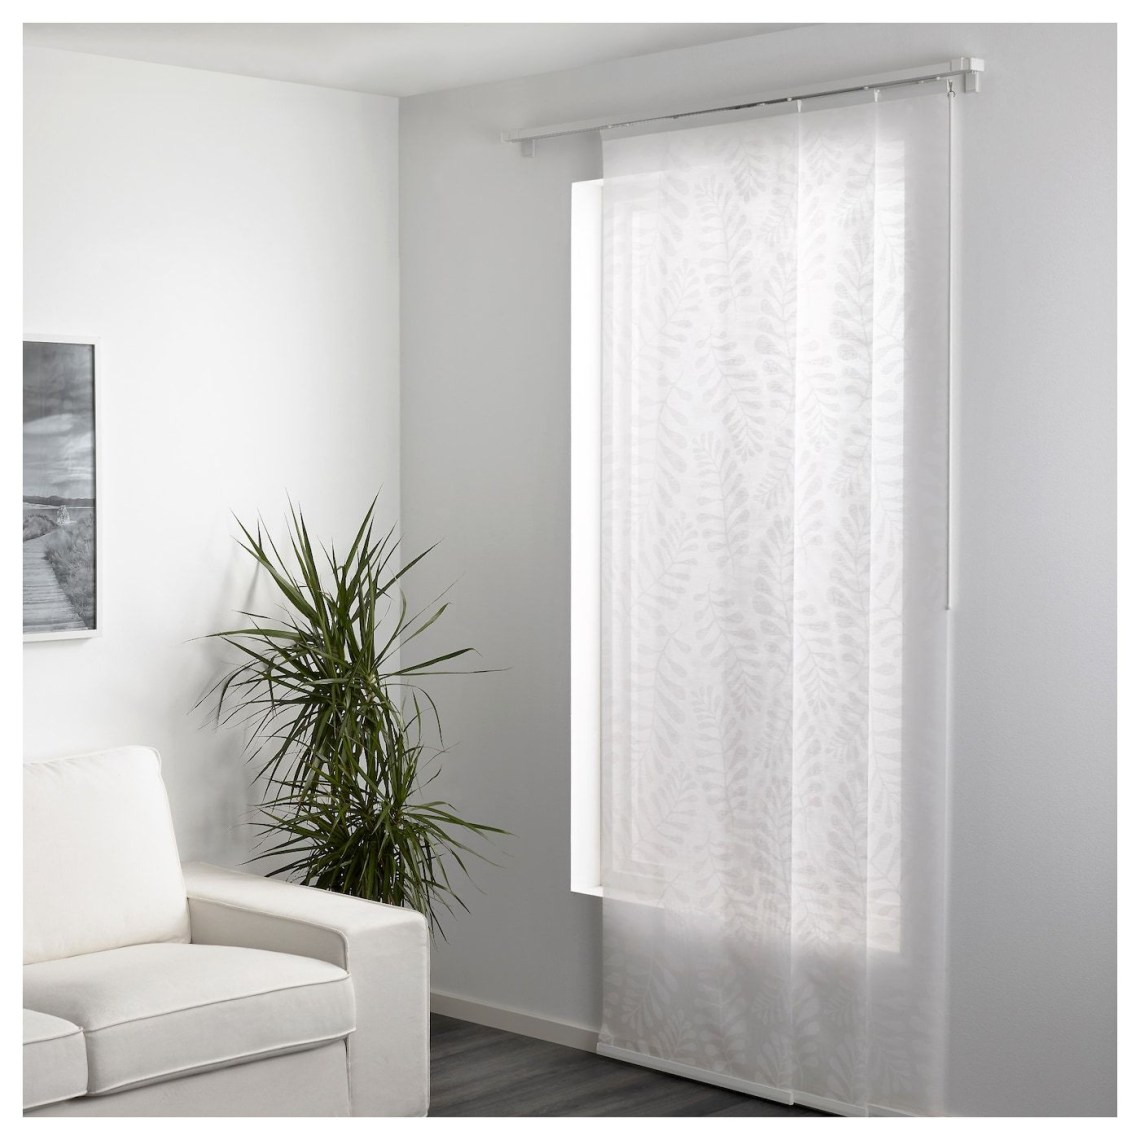 Ikea Yrla White White Panel Curtain White Paneling